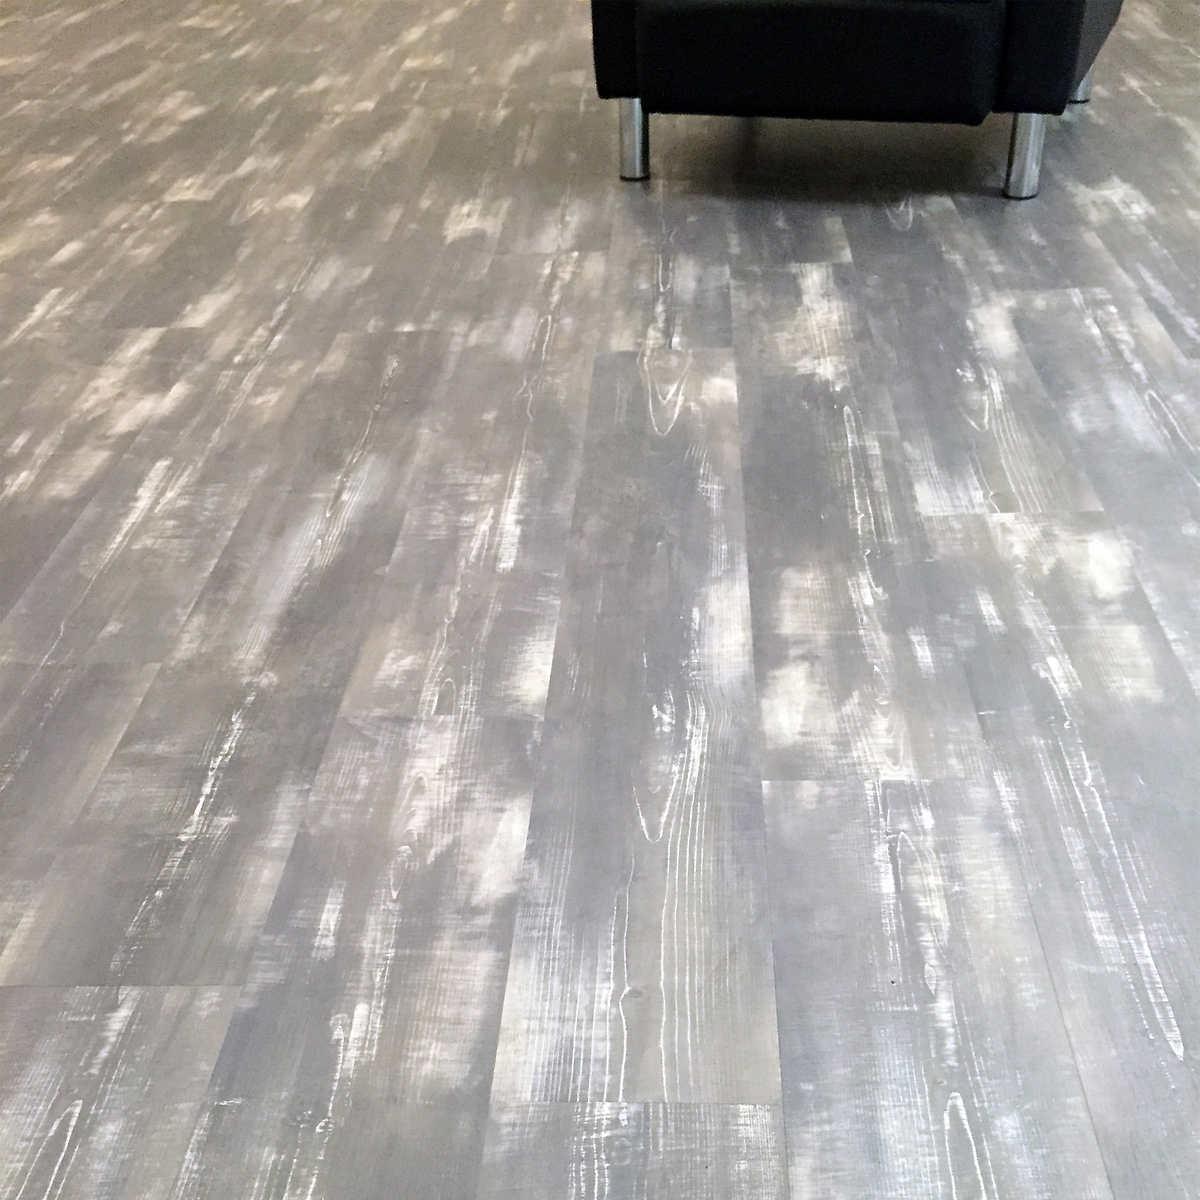 Vinyl Tile Flooring bardwin almond vinyl tile 21661 Fossil Oak Power Click Flooring Luxury Vinyl Tile System